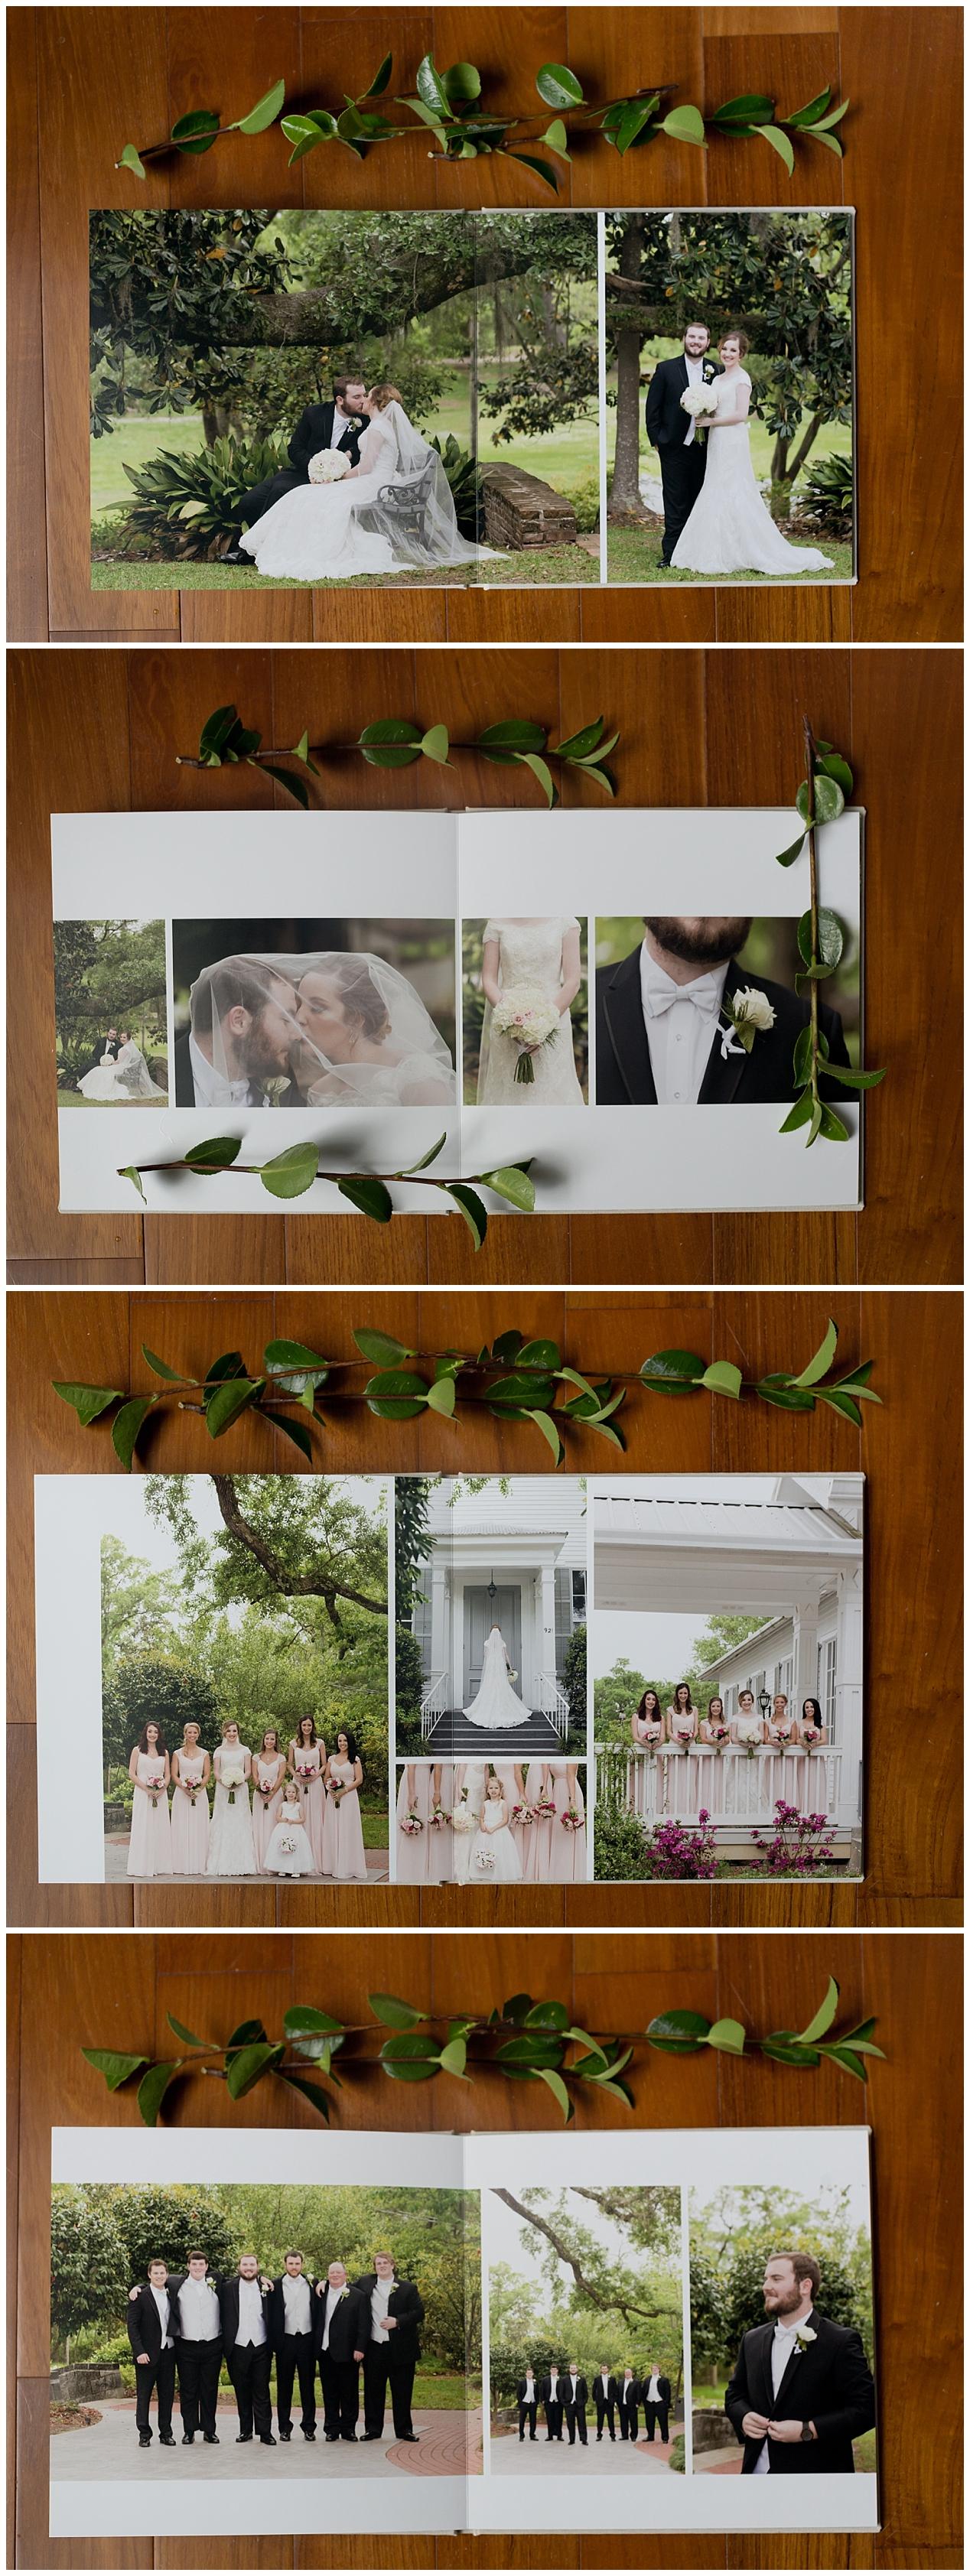 wedding portraits in wedding album - Ocean Springs wedding photographer